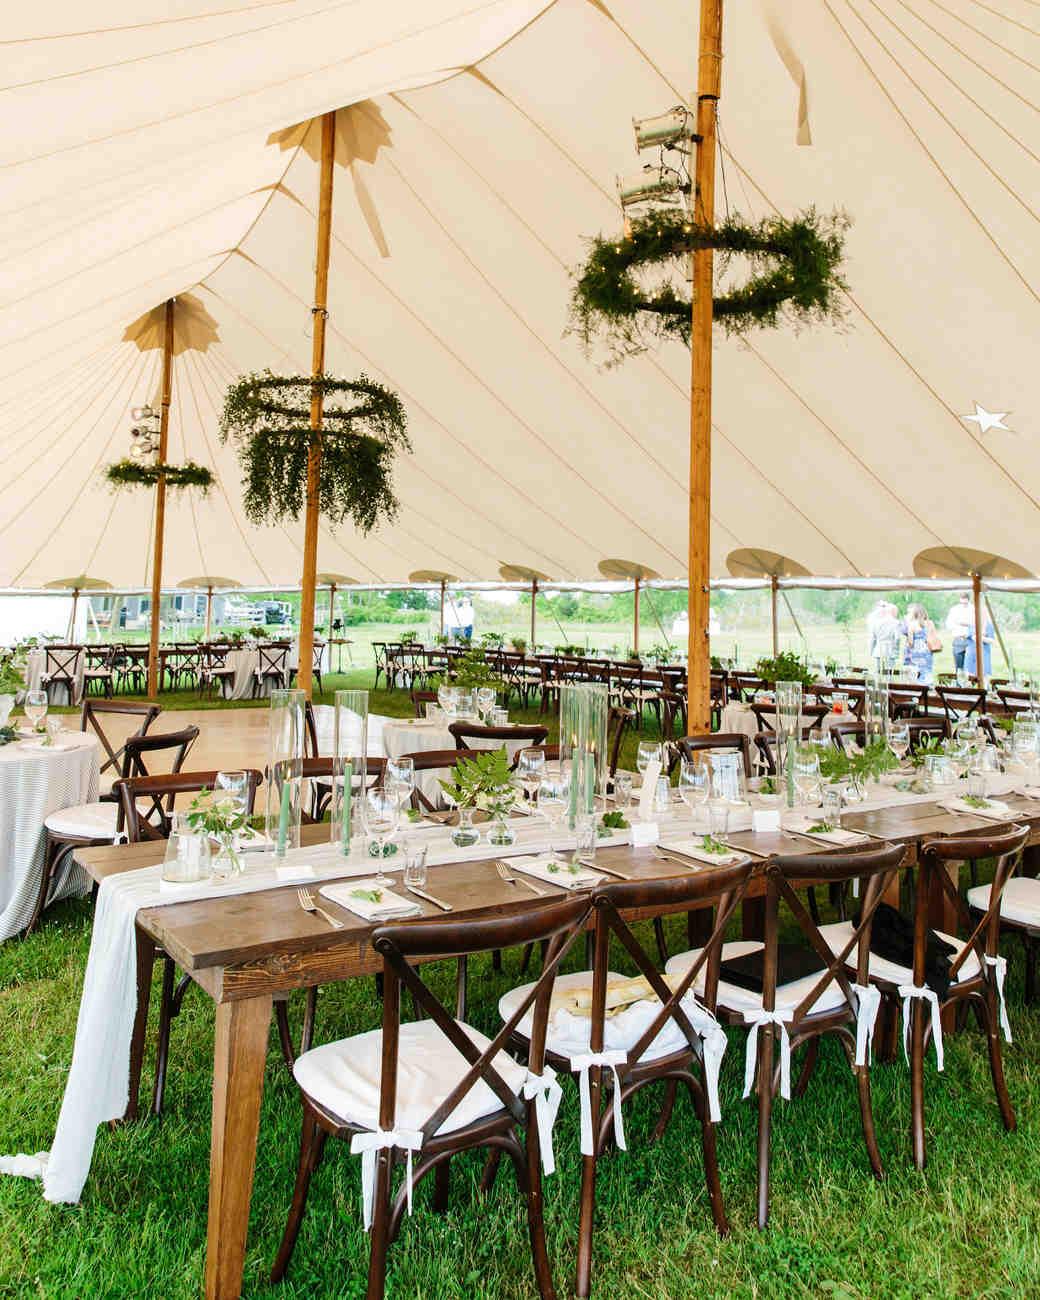 molly ed wedding reception tent